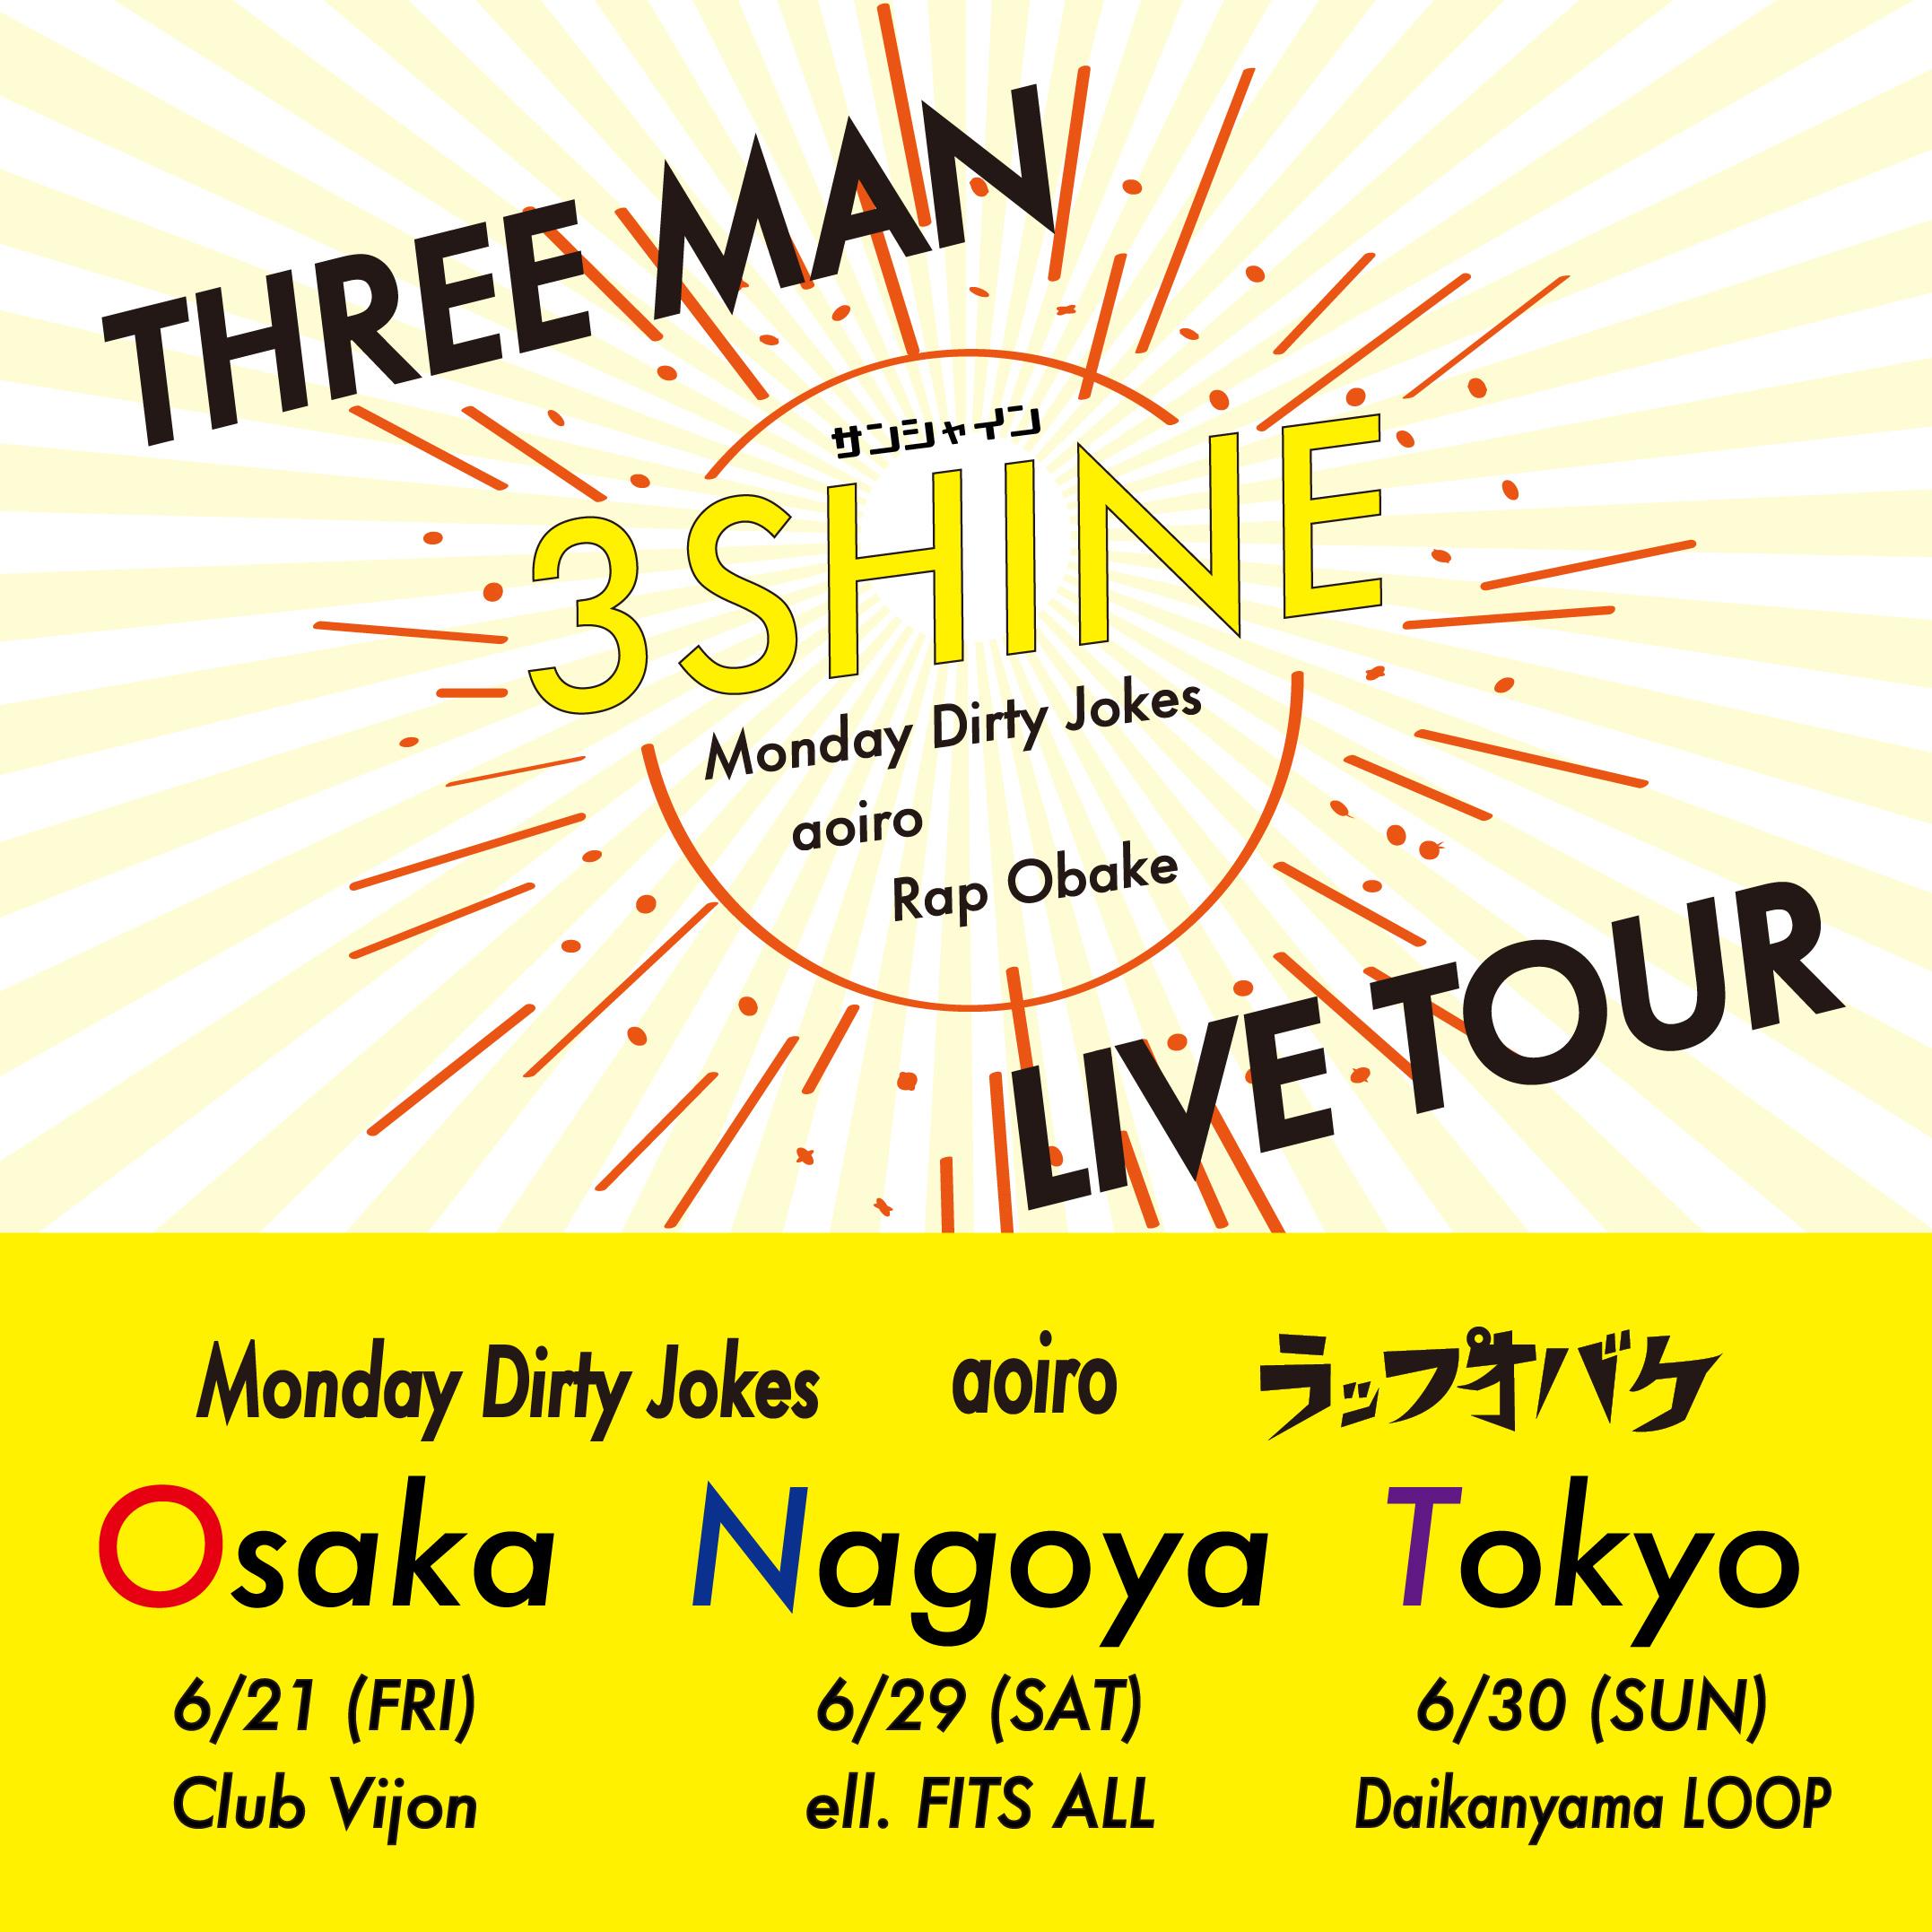 Monday Dirty Jokes × aoiro × ラップオバケ スリーマン東名阪ツアー 【3SHINE】